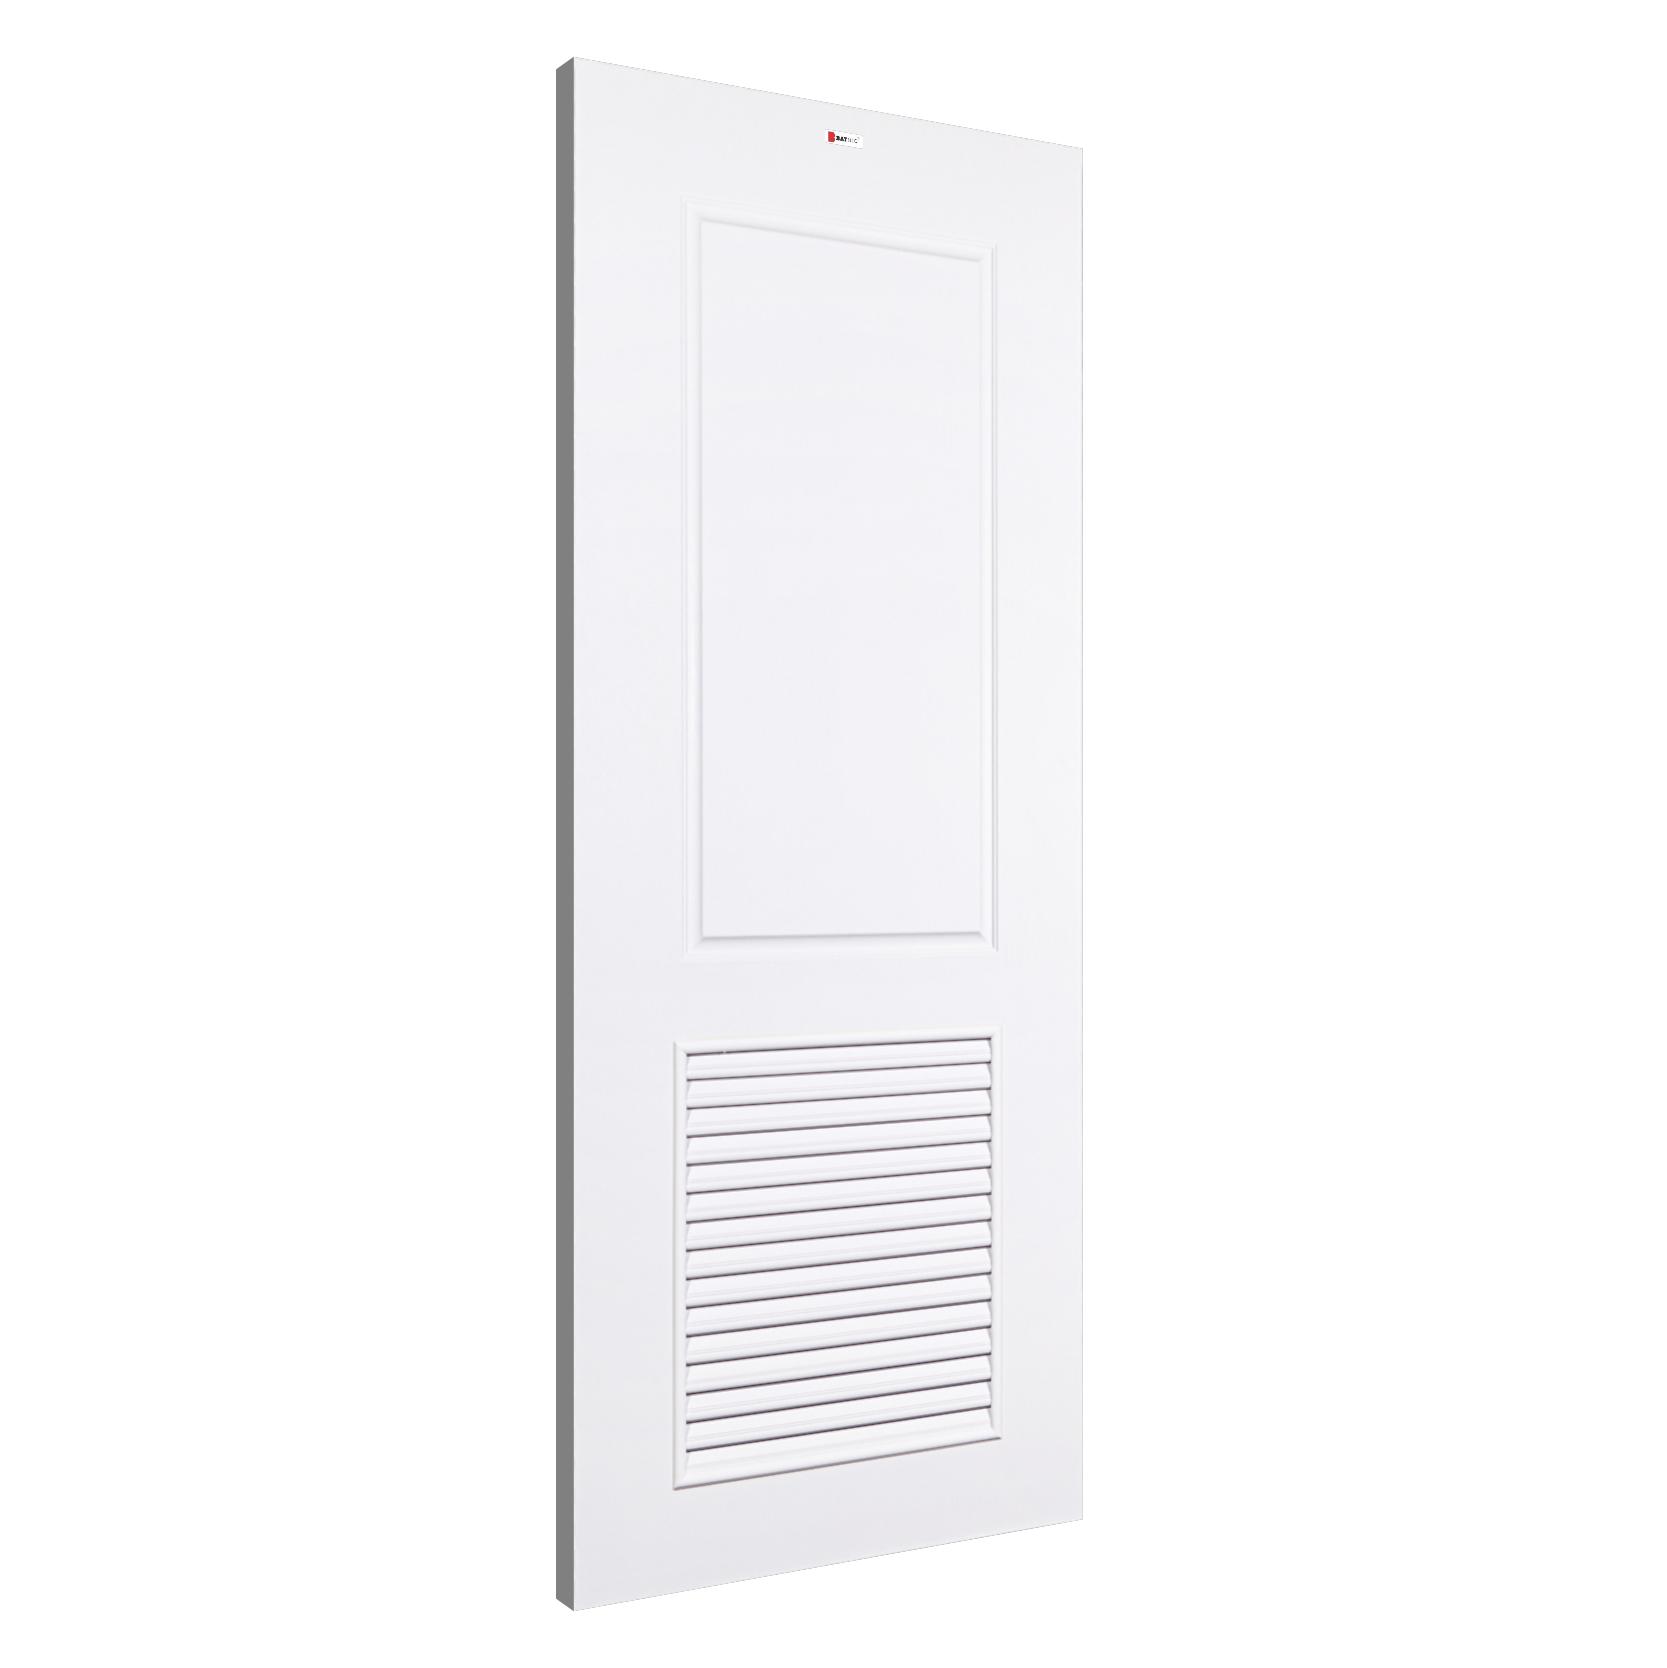 door-upvc-bathic-btl204-white-3